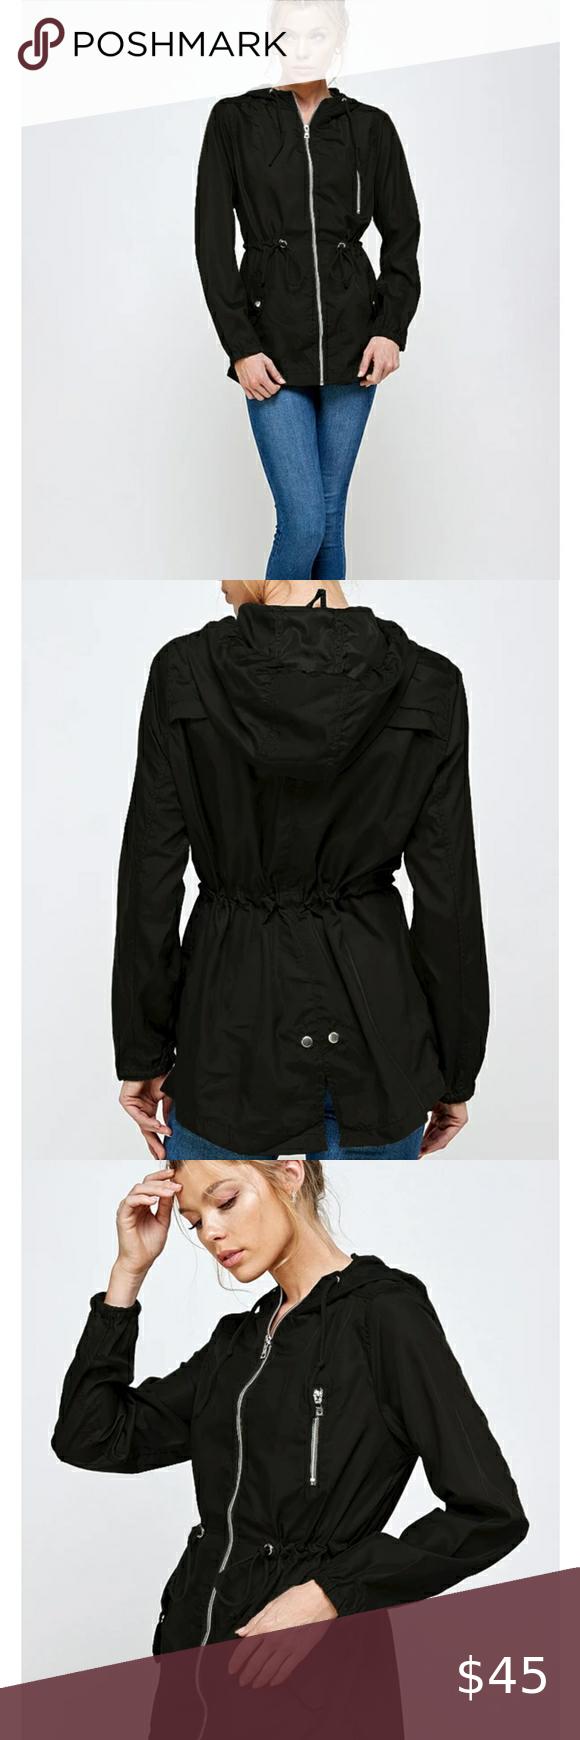 Black Ambiance Lightweight Jacket Coats Jackets Women Lightweight Jacket Ambiance Apparel [ 1740 x 580 Pixel ]